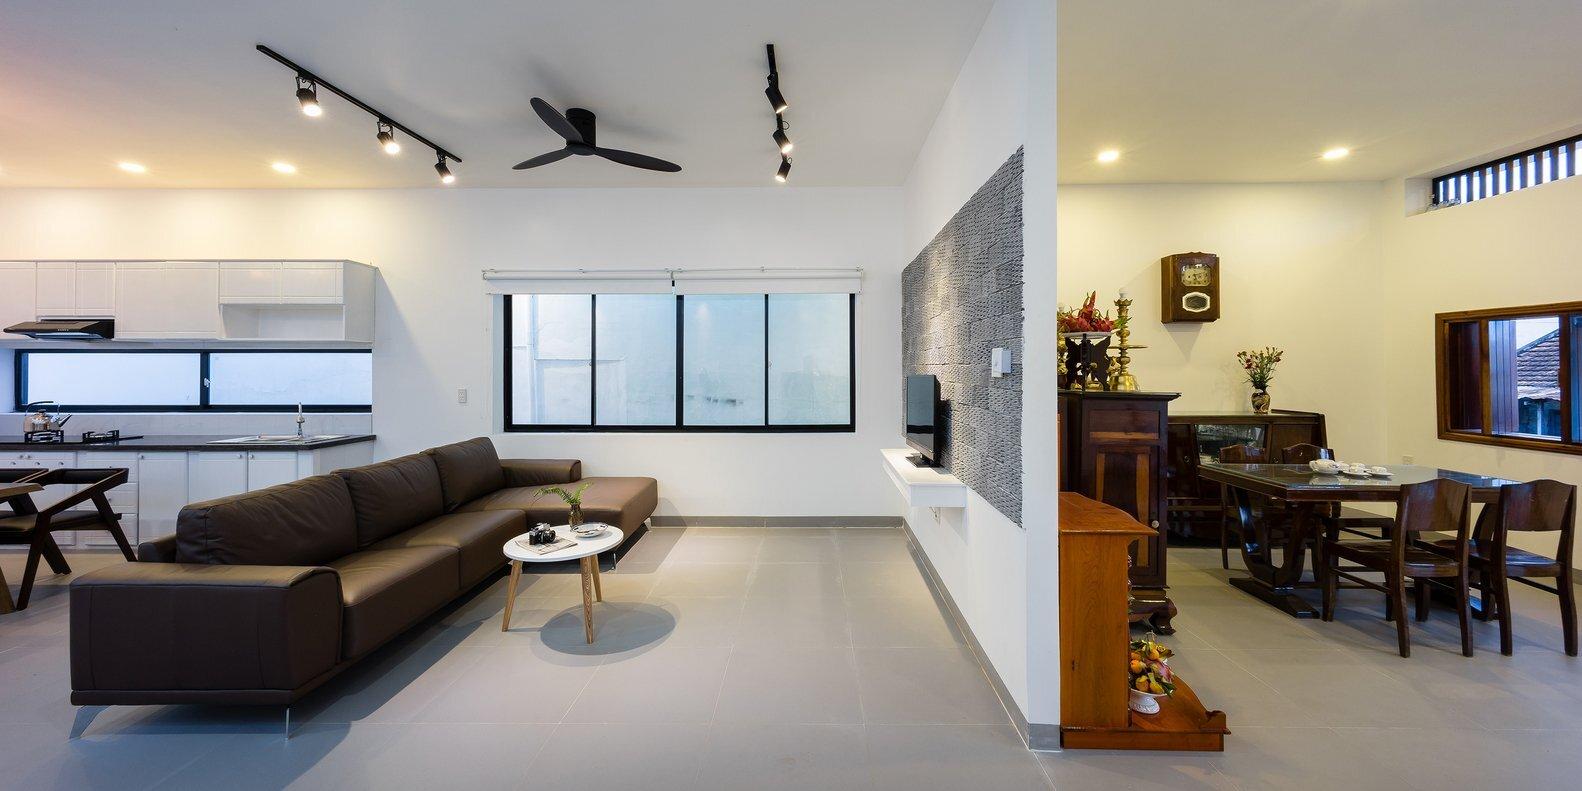 TP House - Sawadeesign Studio - Vietnam - Living Room and Worship Area - Humble Homes